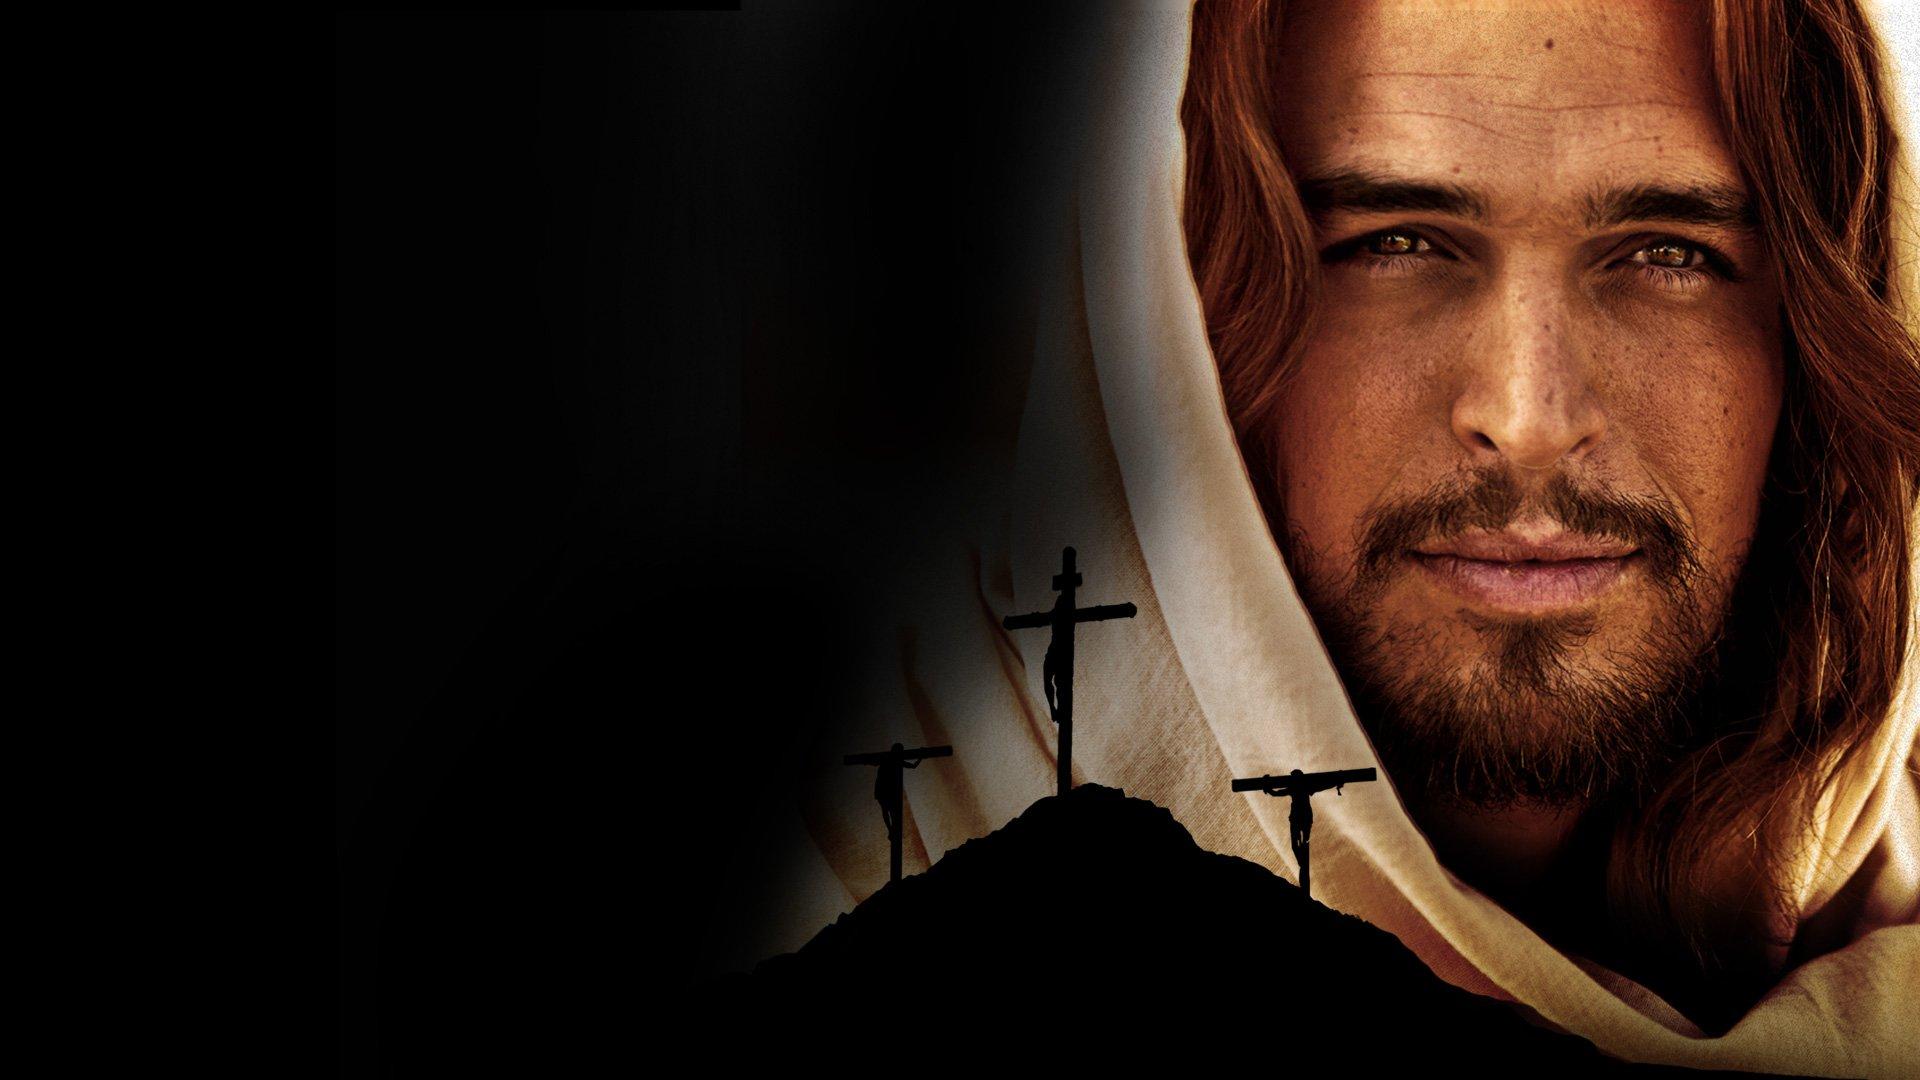 Son of god drama religion movie film christian god son - Jesus hd 1080p ...